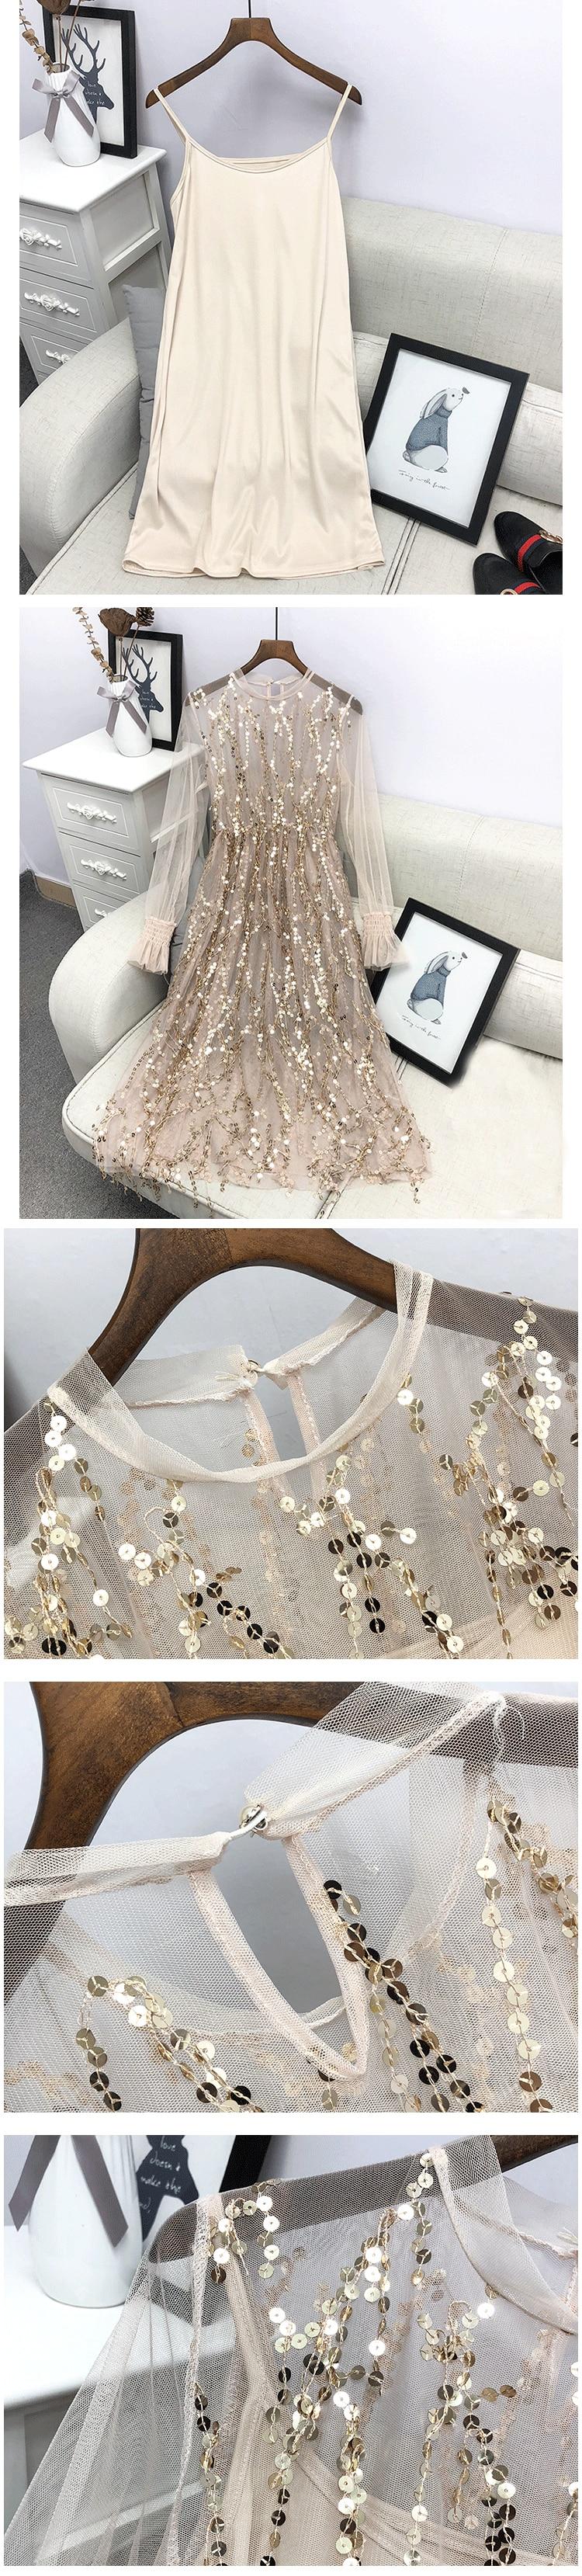 Sequins Elegant Party Dress 4